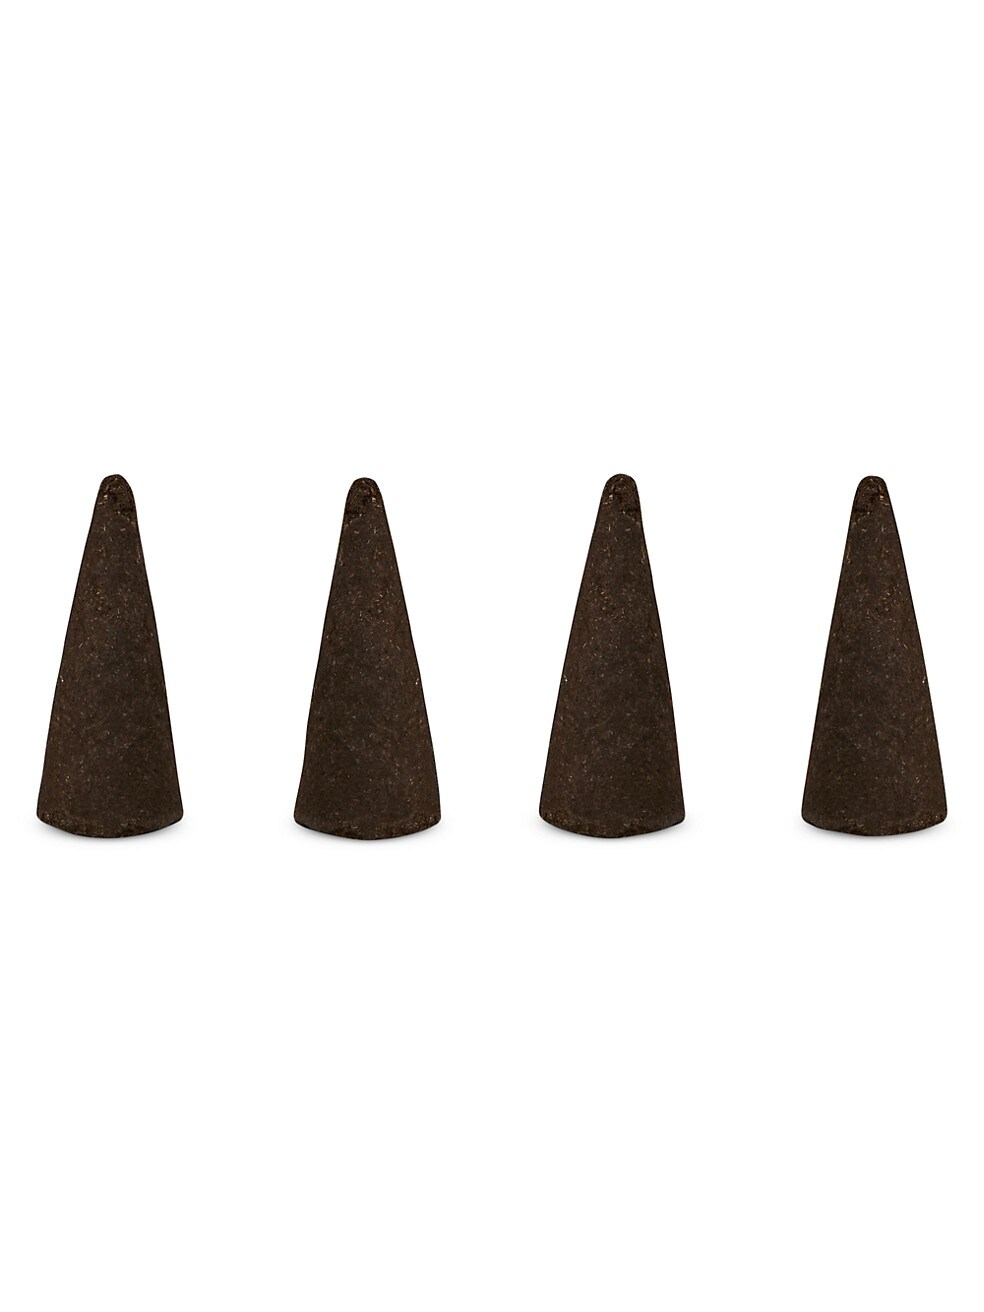 Tom Dixon Fog 20-Piece Royalty Scented Incense Cone Set